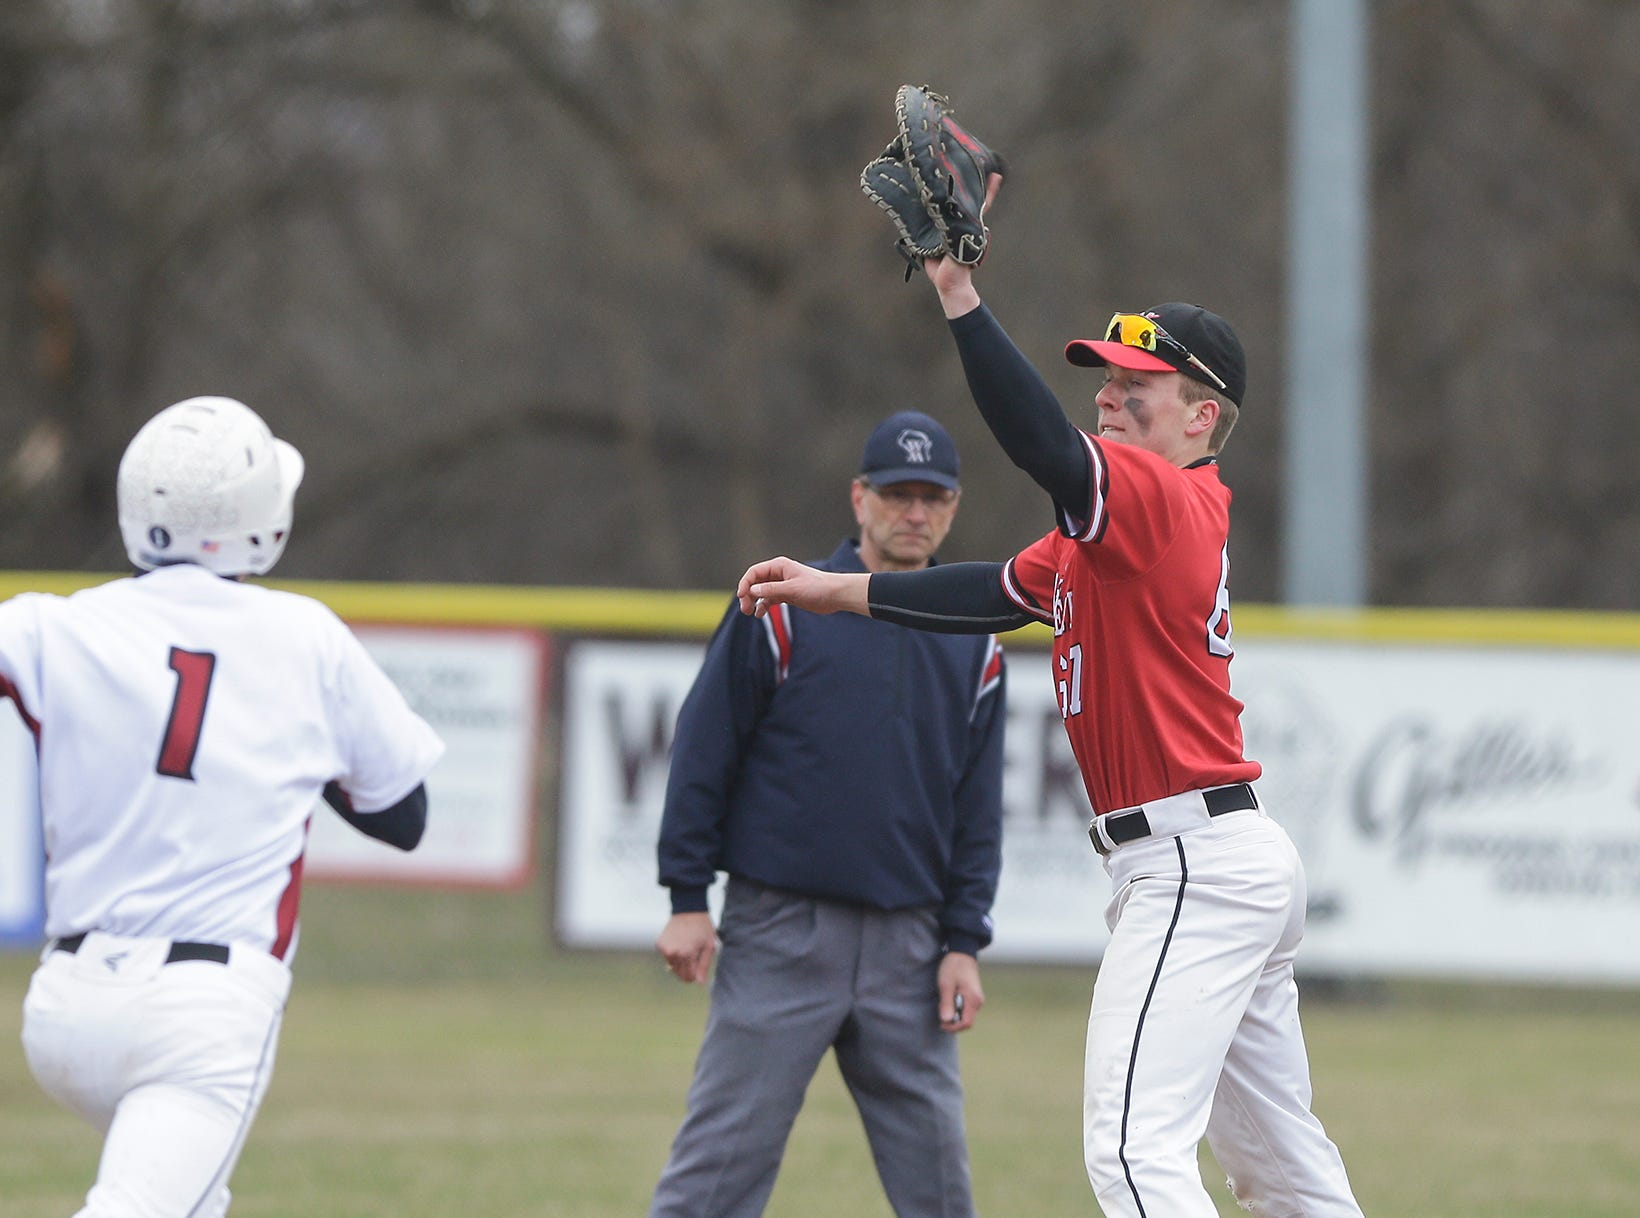 Neenah High School baseball's Logan Eiden tags out Fond du Lac High School's Caden Krug during their game Thursday, April 18, 2019 in Fond du Lac, Wis. Doug Raflik/USA TODAY NETWORK-Wisconsin